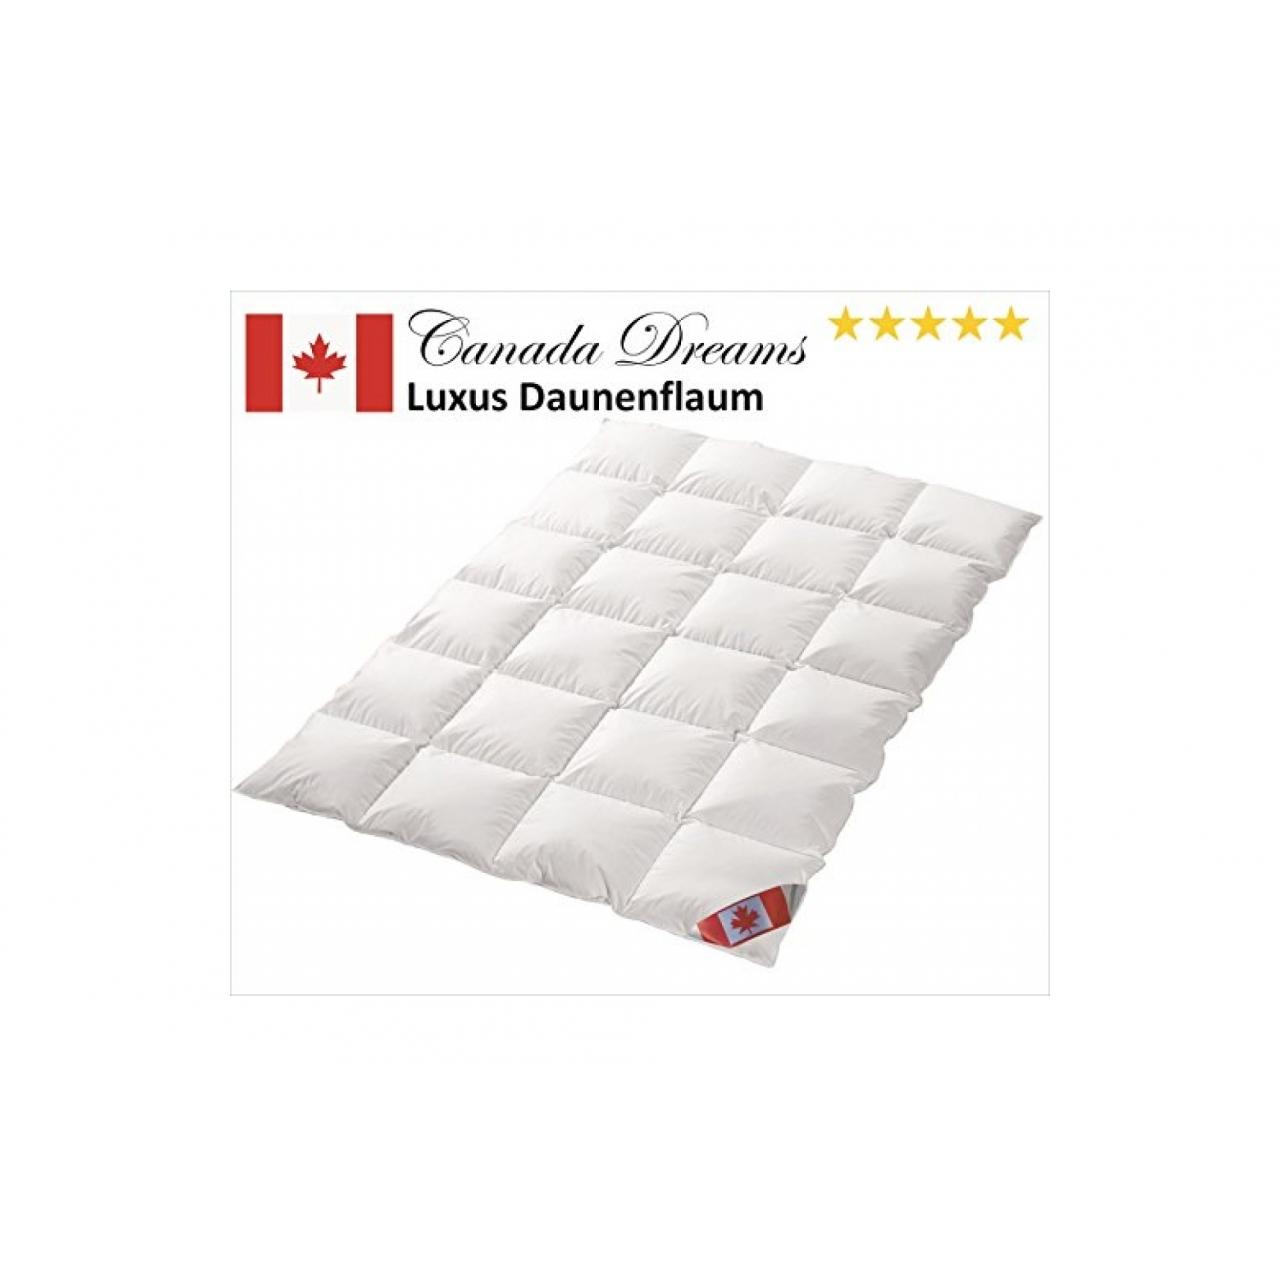 canada dreams luxus test. Black Bedroom Furniture Sets. Home Design Ideas